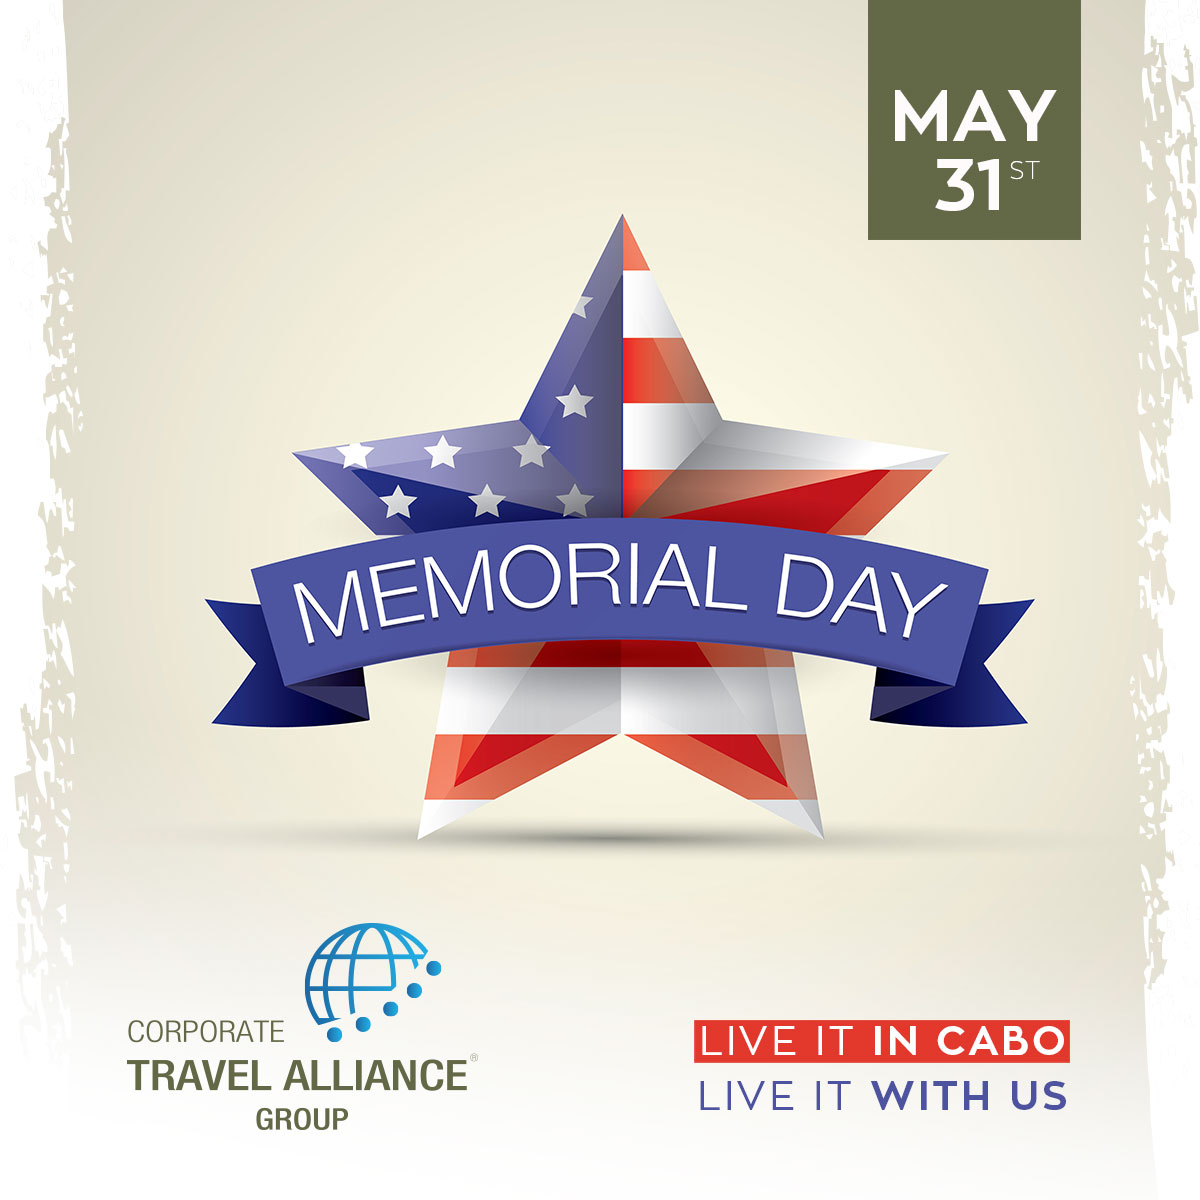 Remember & honor  MEXTRAVELERbcs #discoverbcs #loscabos #traveling #visitBajaSur  #memorialday https://t.co/u4wIppIo2C